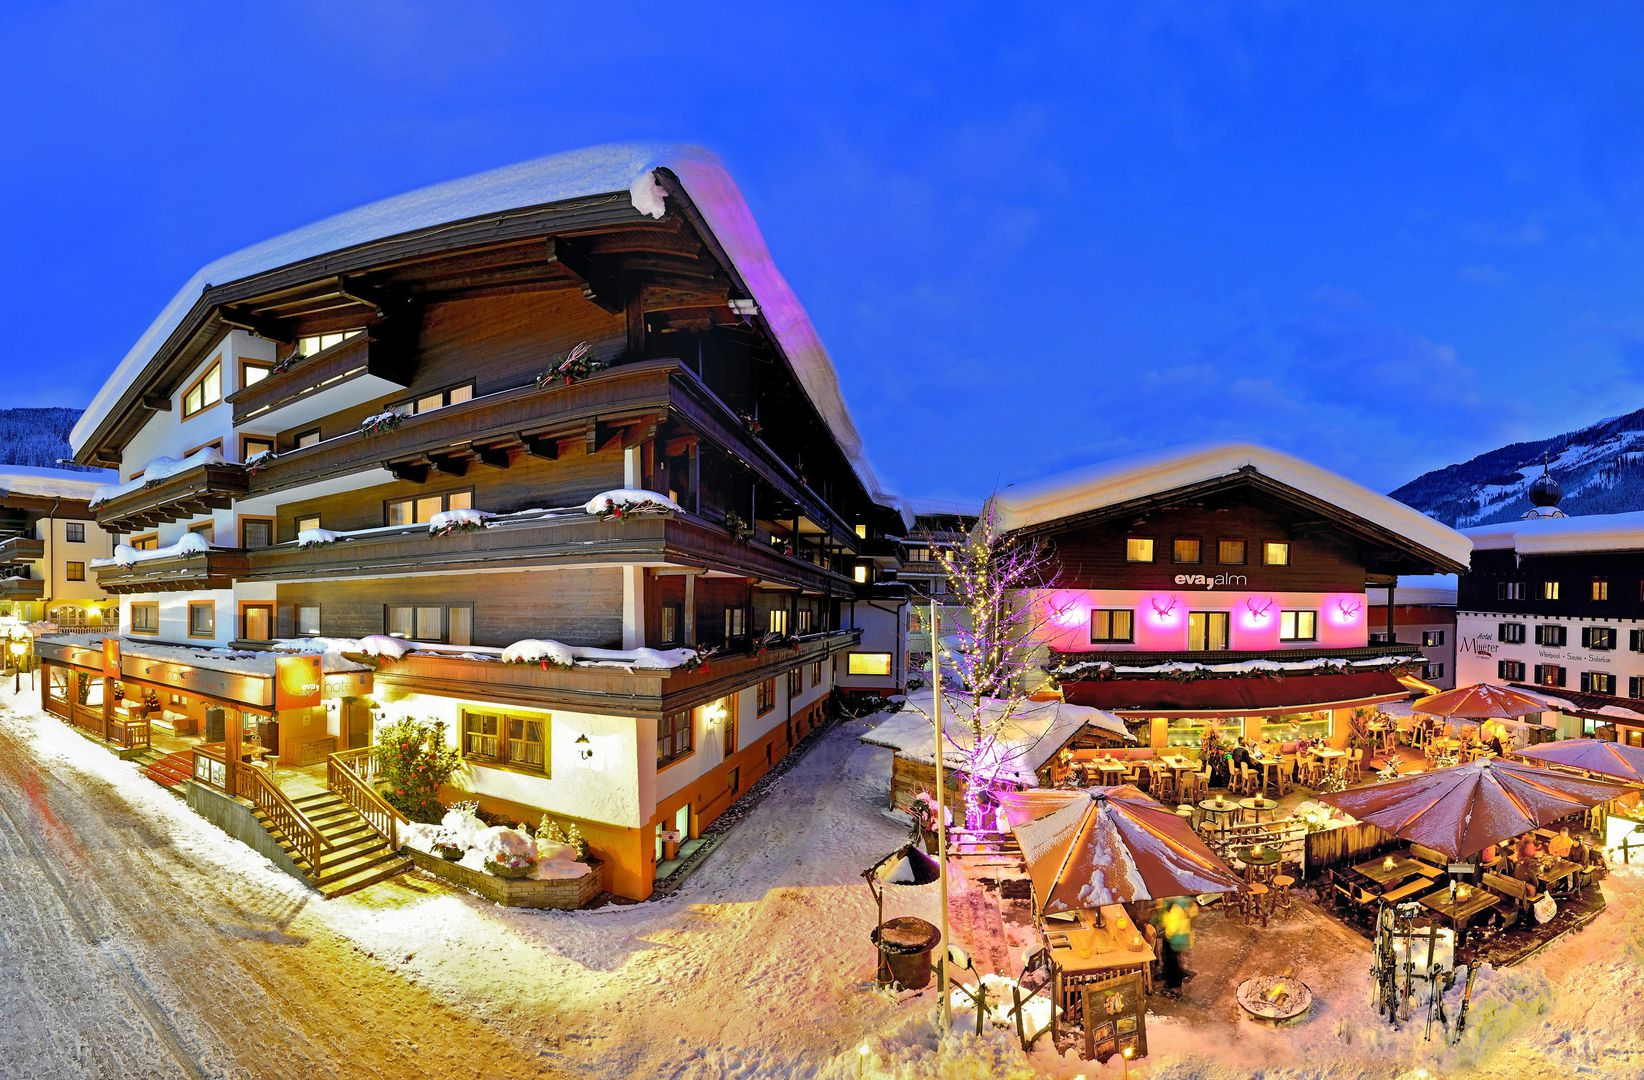 Hotel eva Village - Slide 1